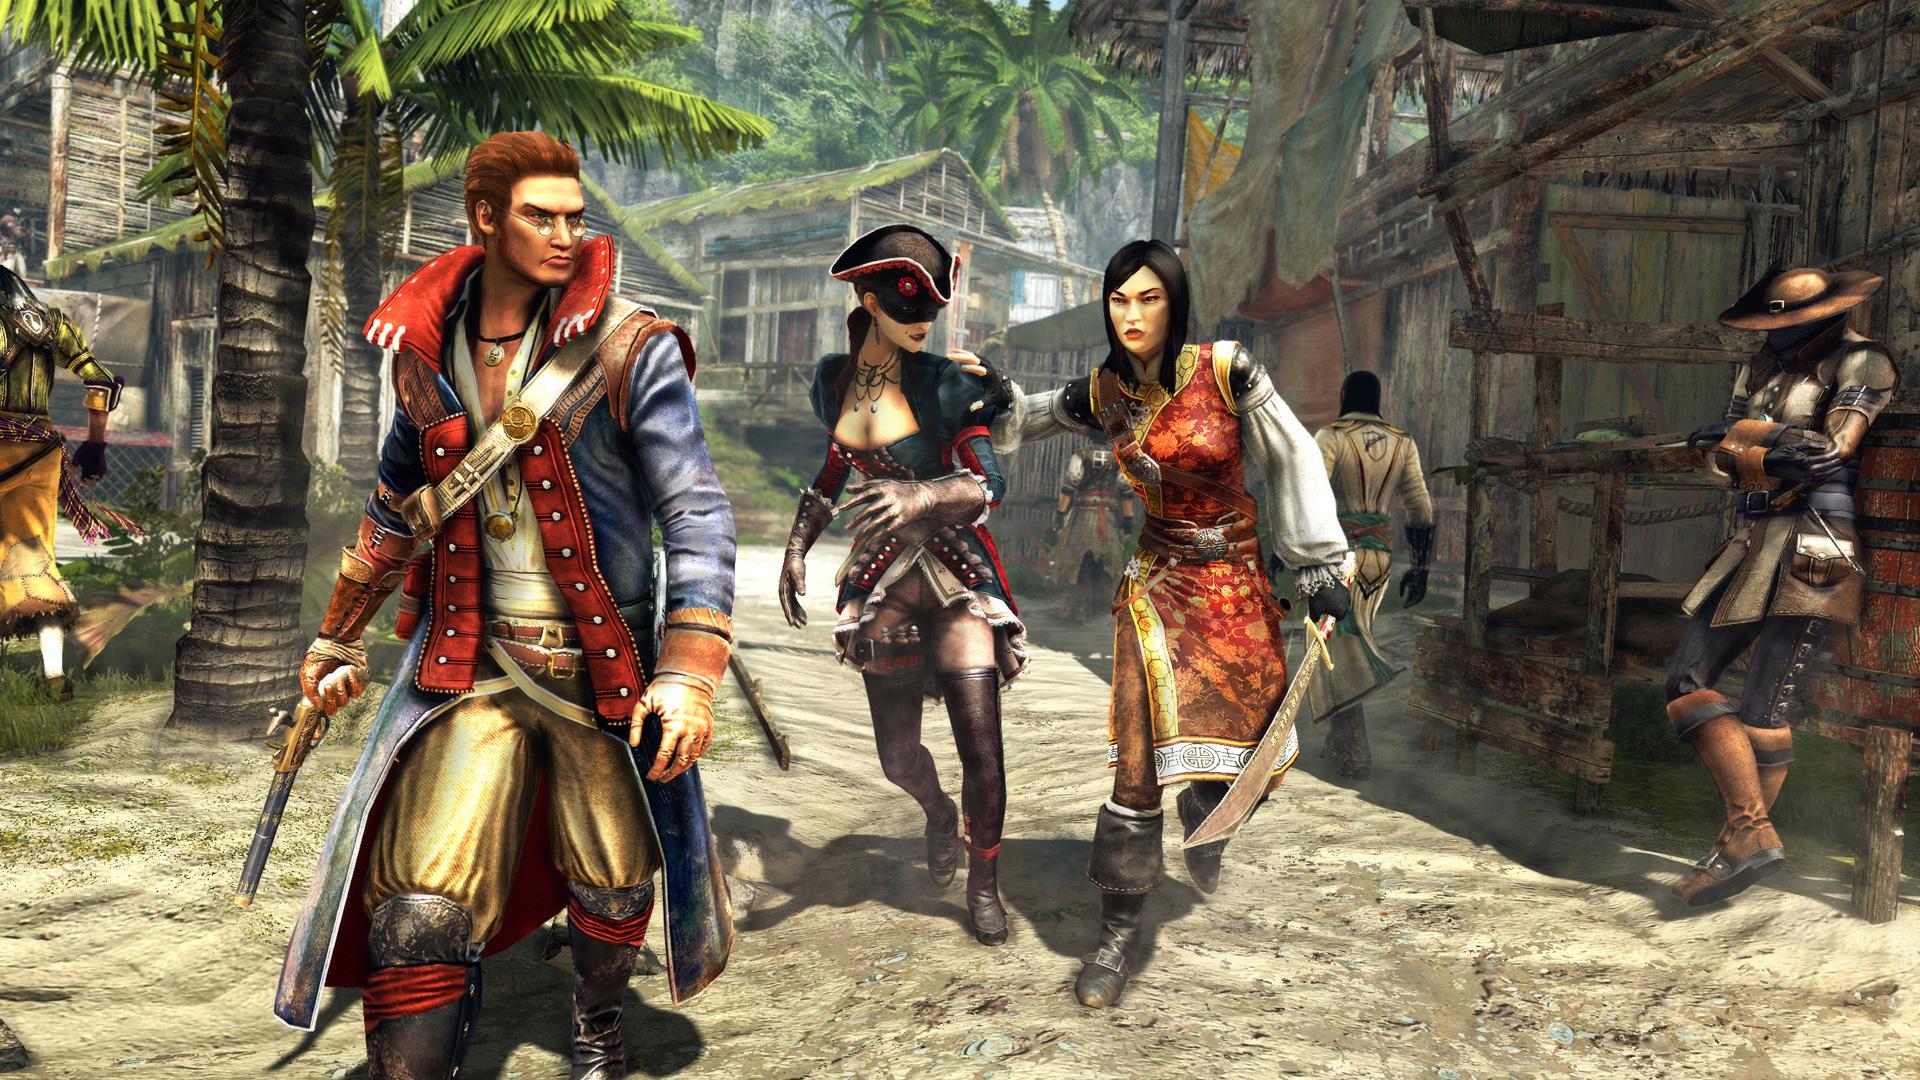 Blackbeard's Wrath DLC for Assassin's Creed 4 arrives Dec. 10